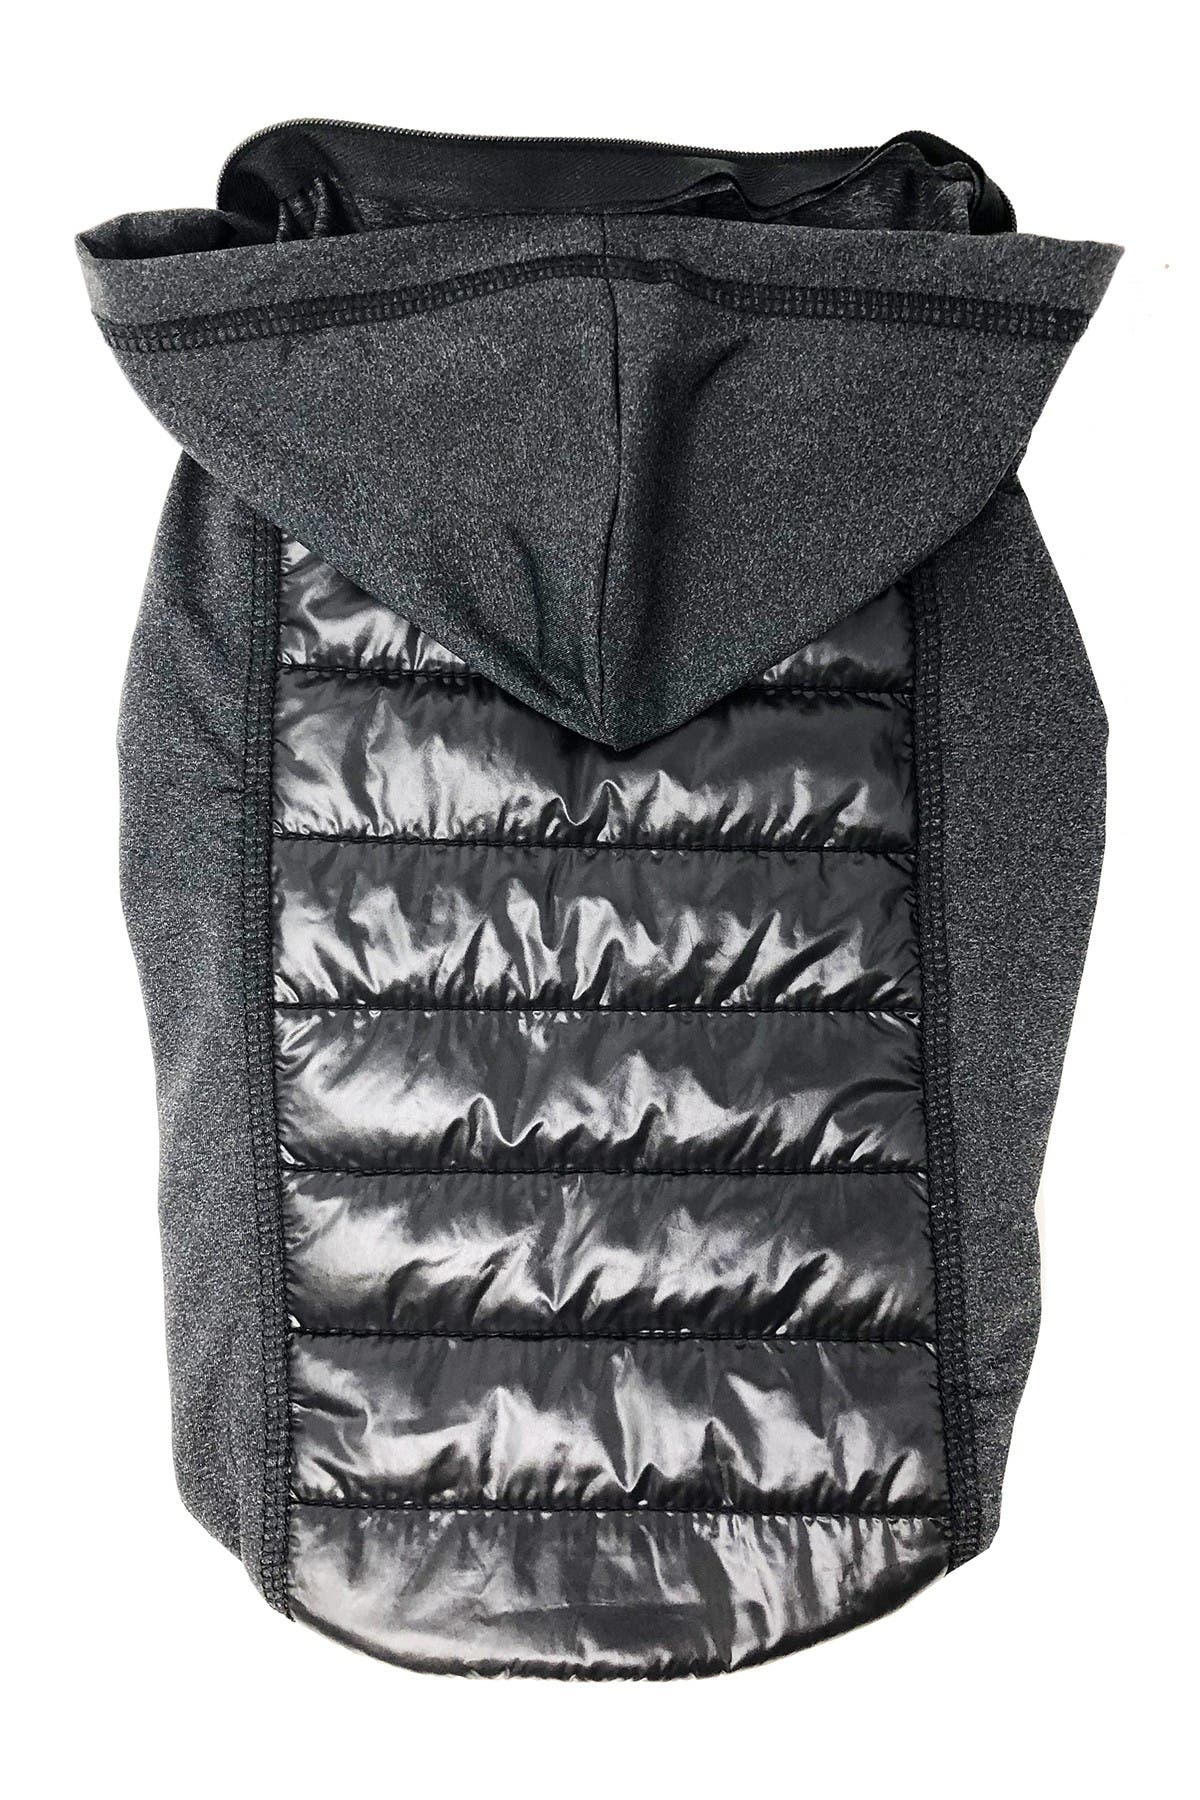 Image of Pet Life 'Apex' Lightweight Hybrid 4-Season Stretch & Quick-Dry Dog Coat w/ Pop out Hood - Medium